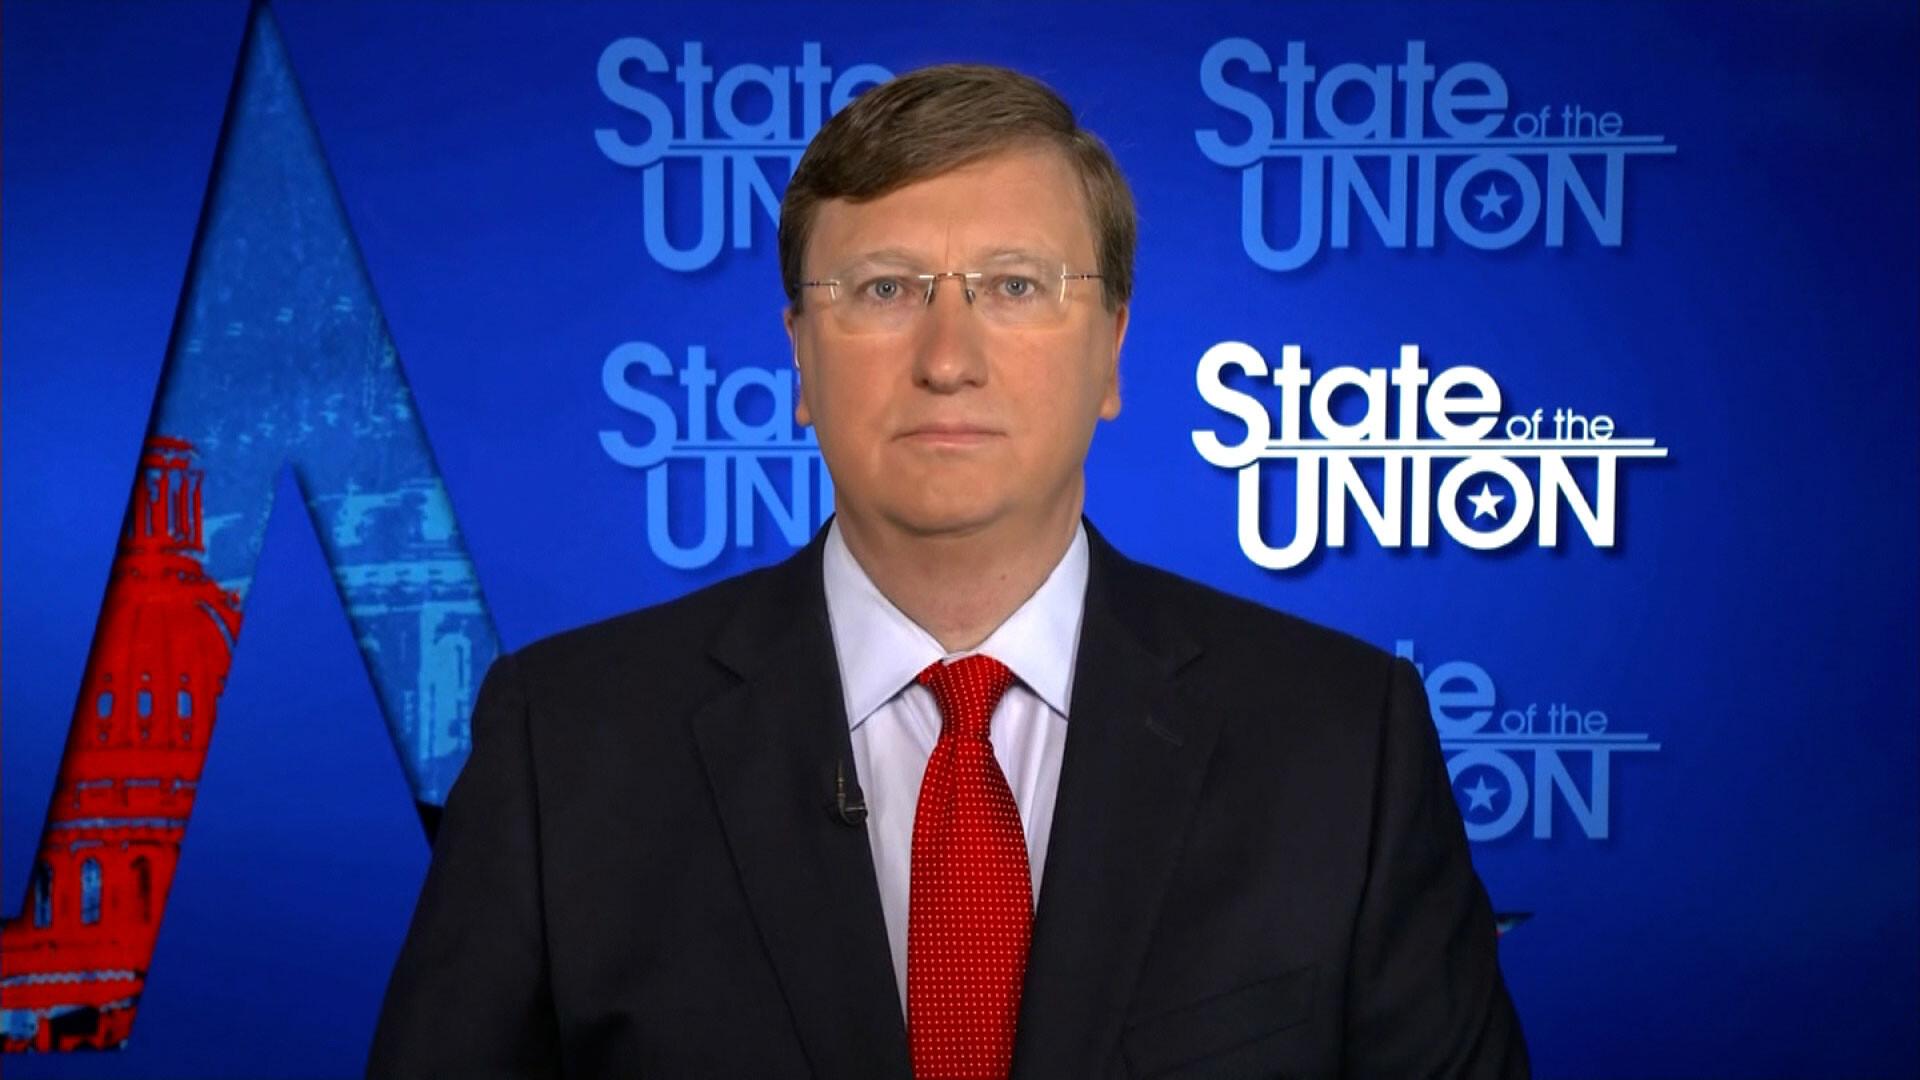 Mississippi GOP governor defends Covid response despite highest number of deaths per capita in US